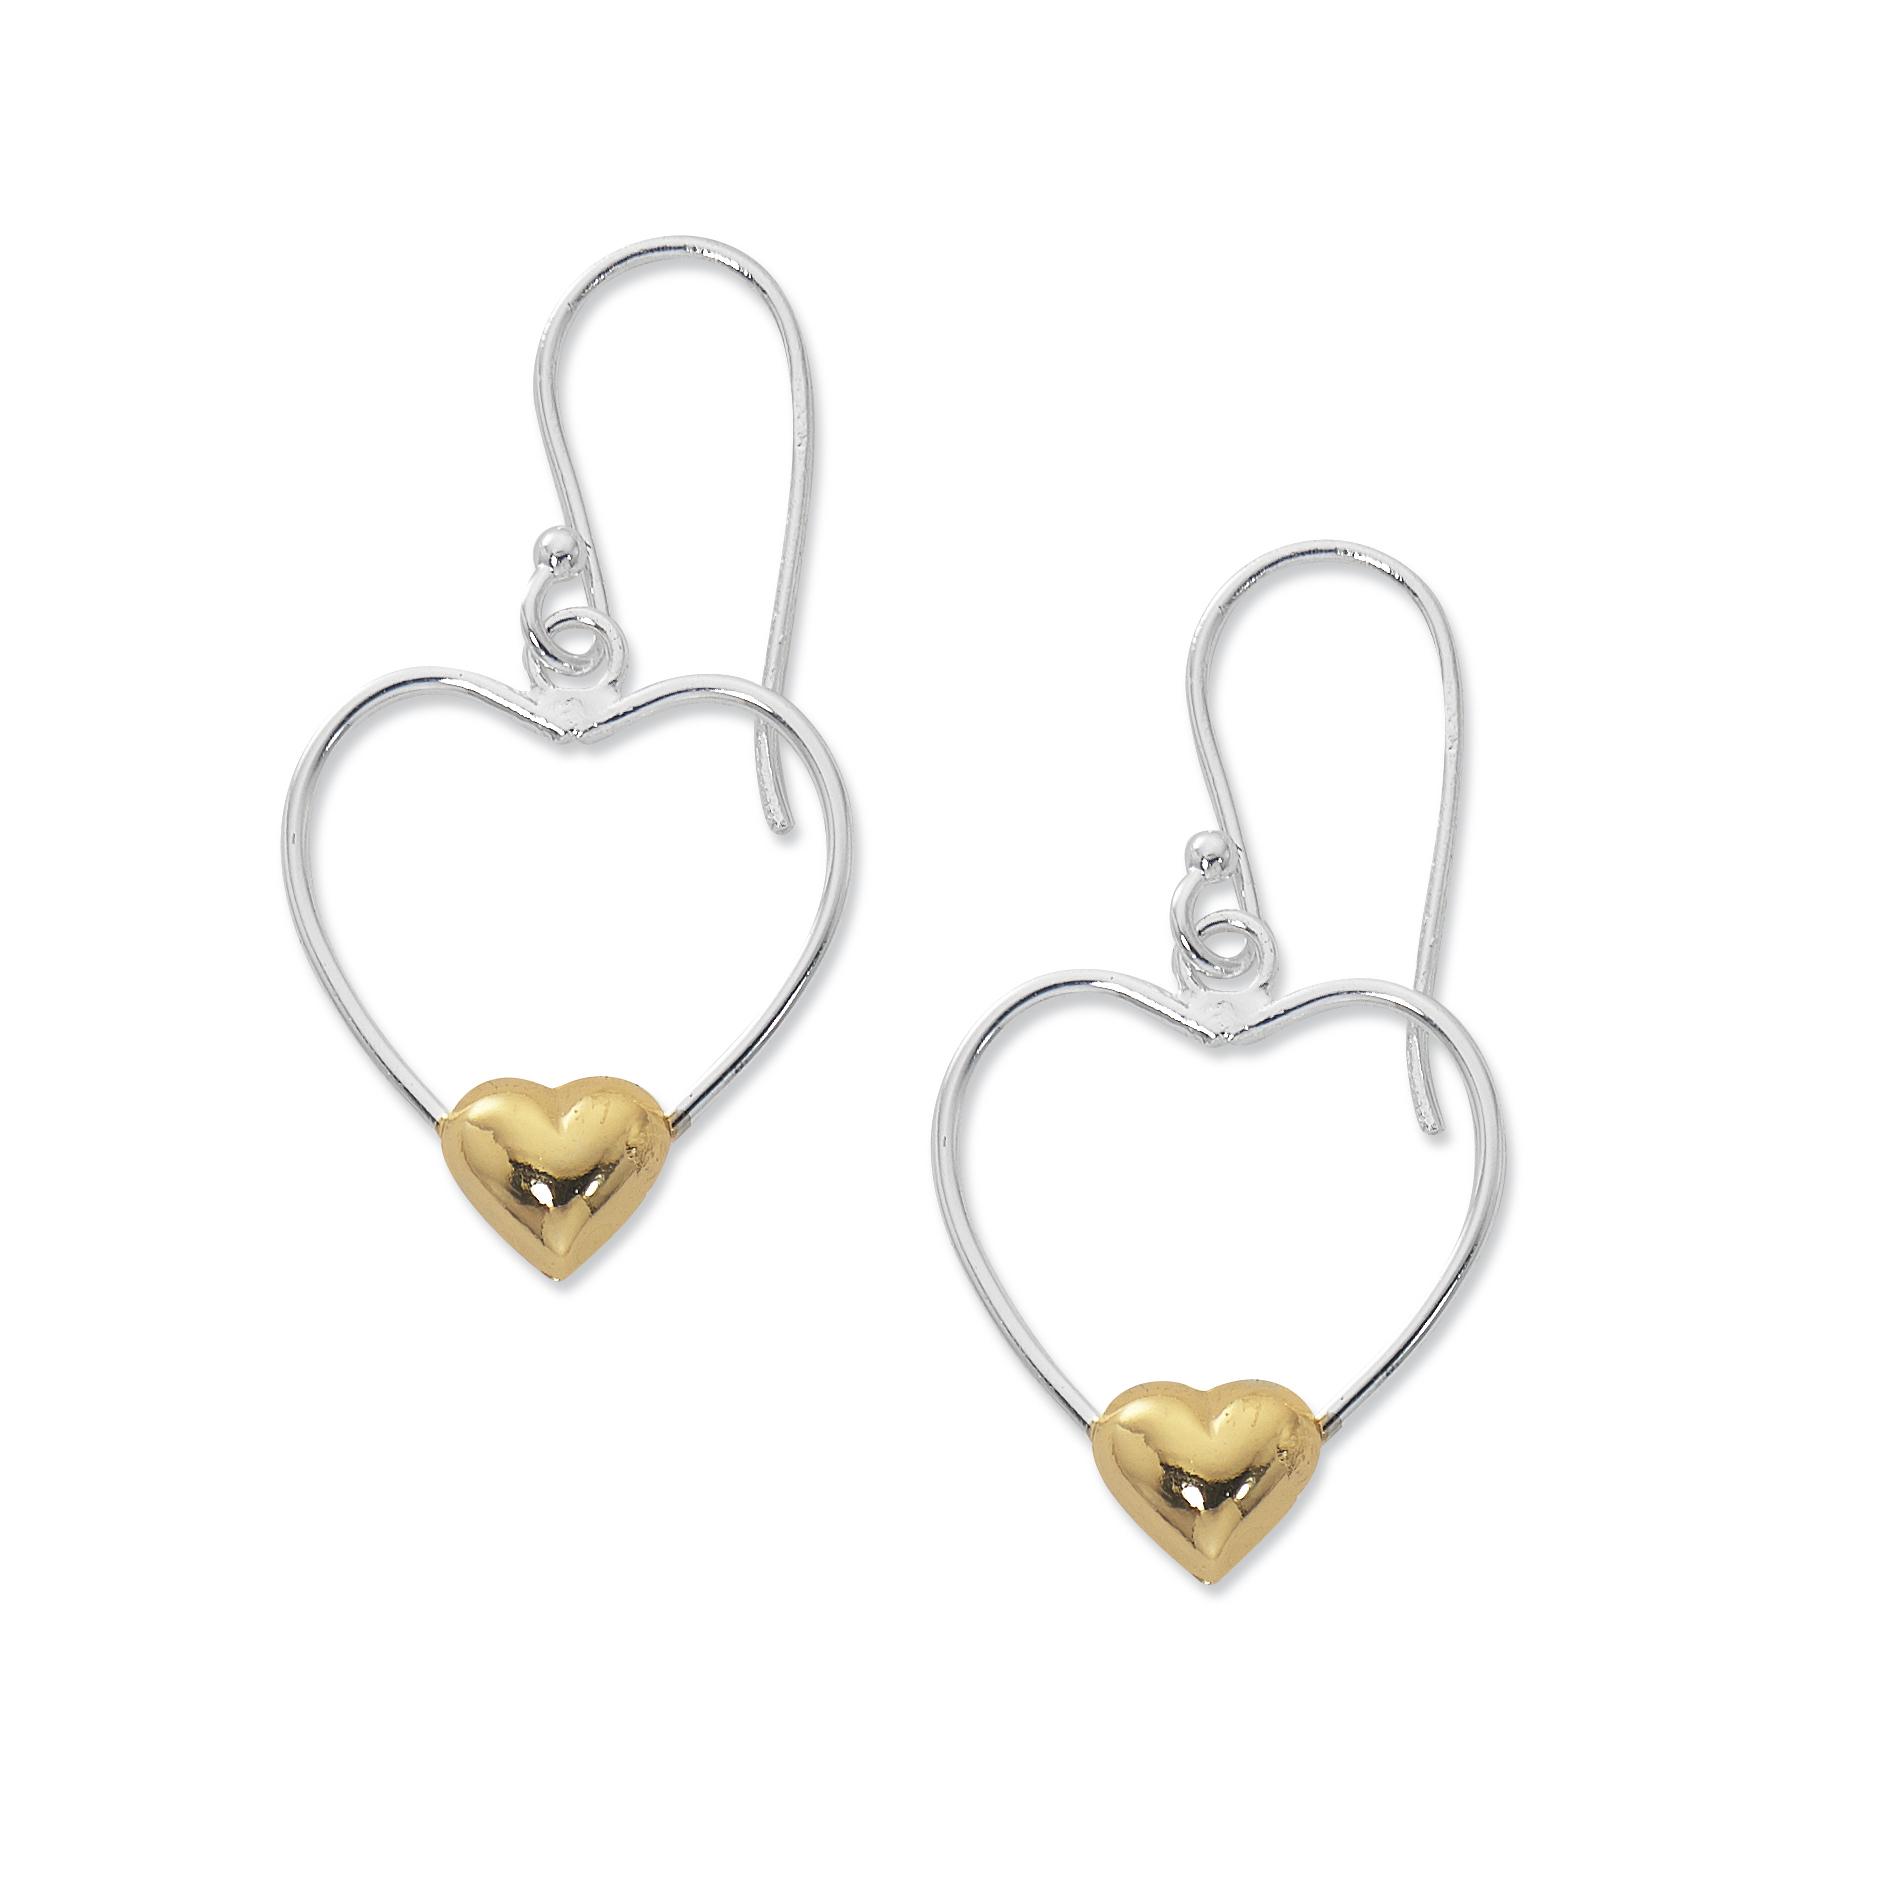 Primavera 24k Gold over Sterling Silver Two Tone Heart Drop Earrings